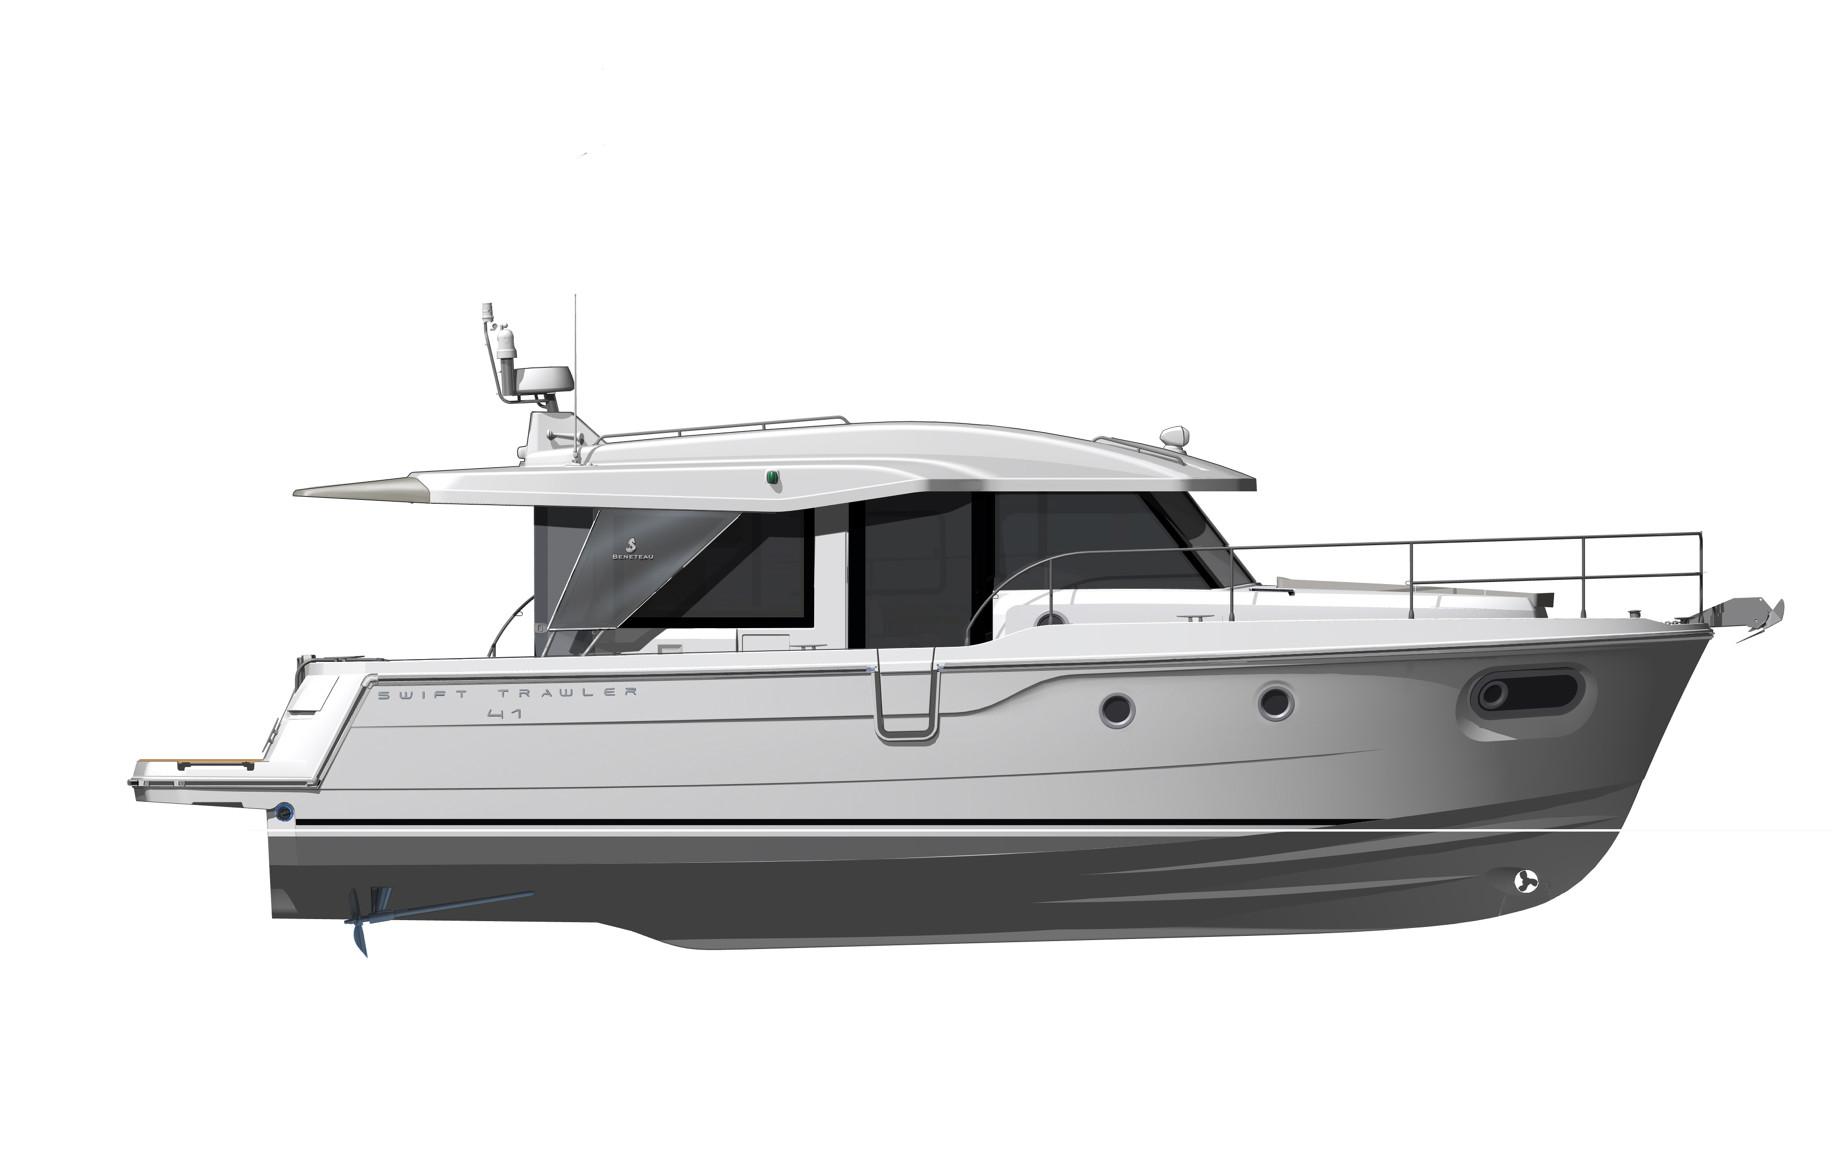 Swift Trawler 41-4